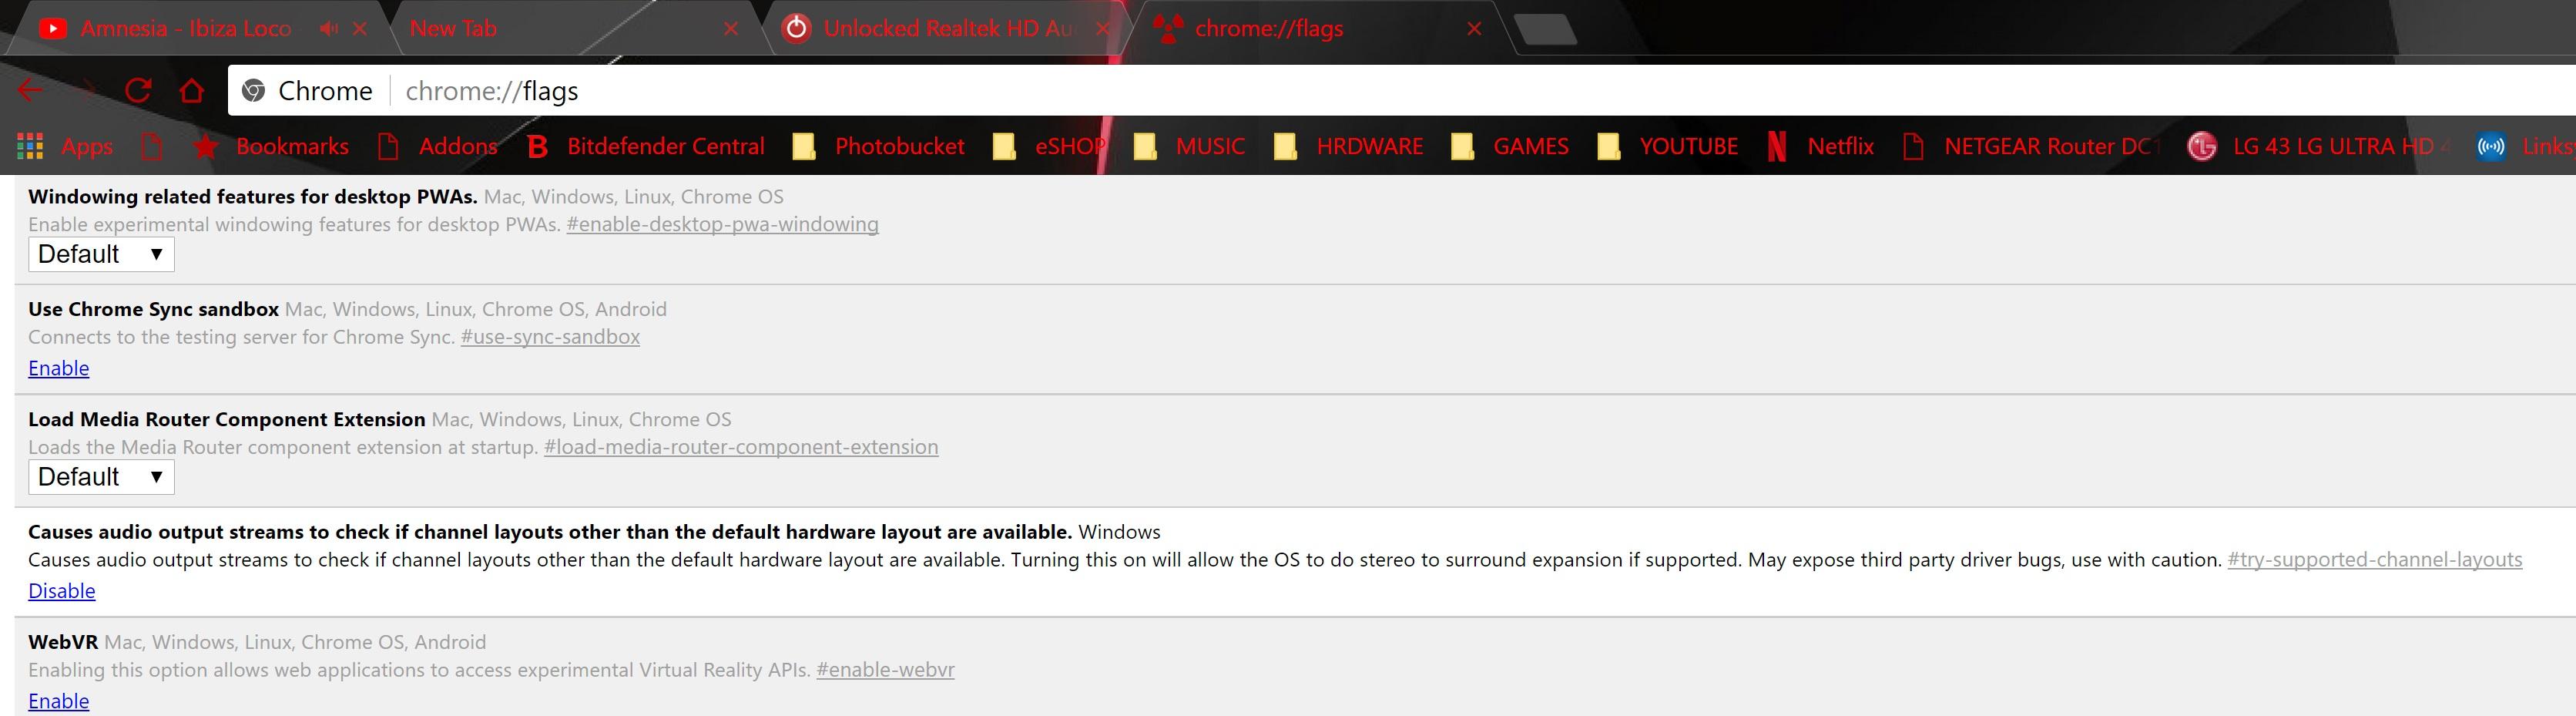 Unlocked Realtek HD Audio Drivers Windows 7 & 8 (With Dolby Digital